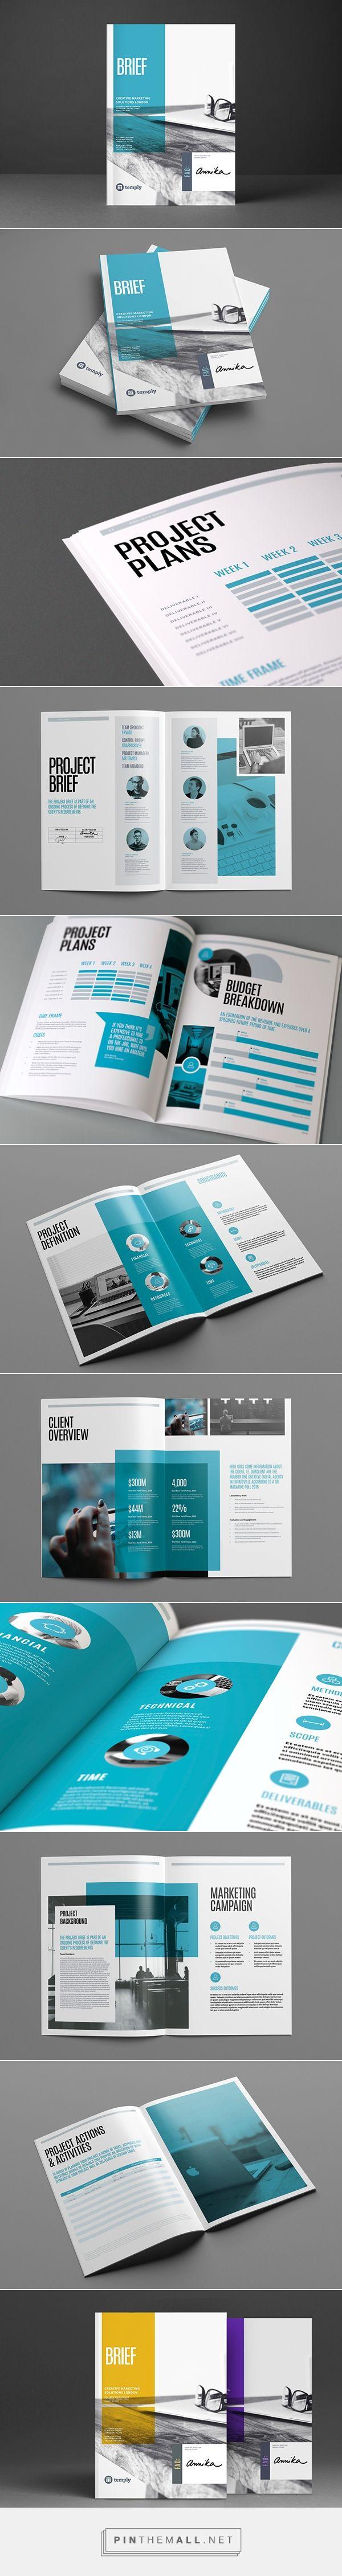 Brief Editorial Design, Graphic Design, Print Design - created via http://pinthemall.net